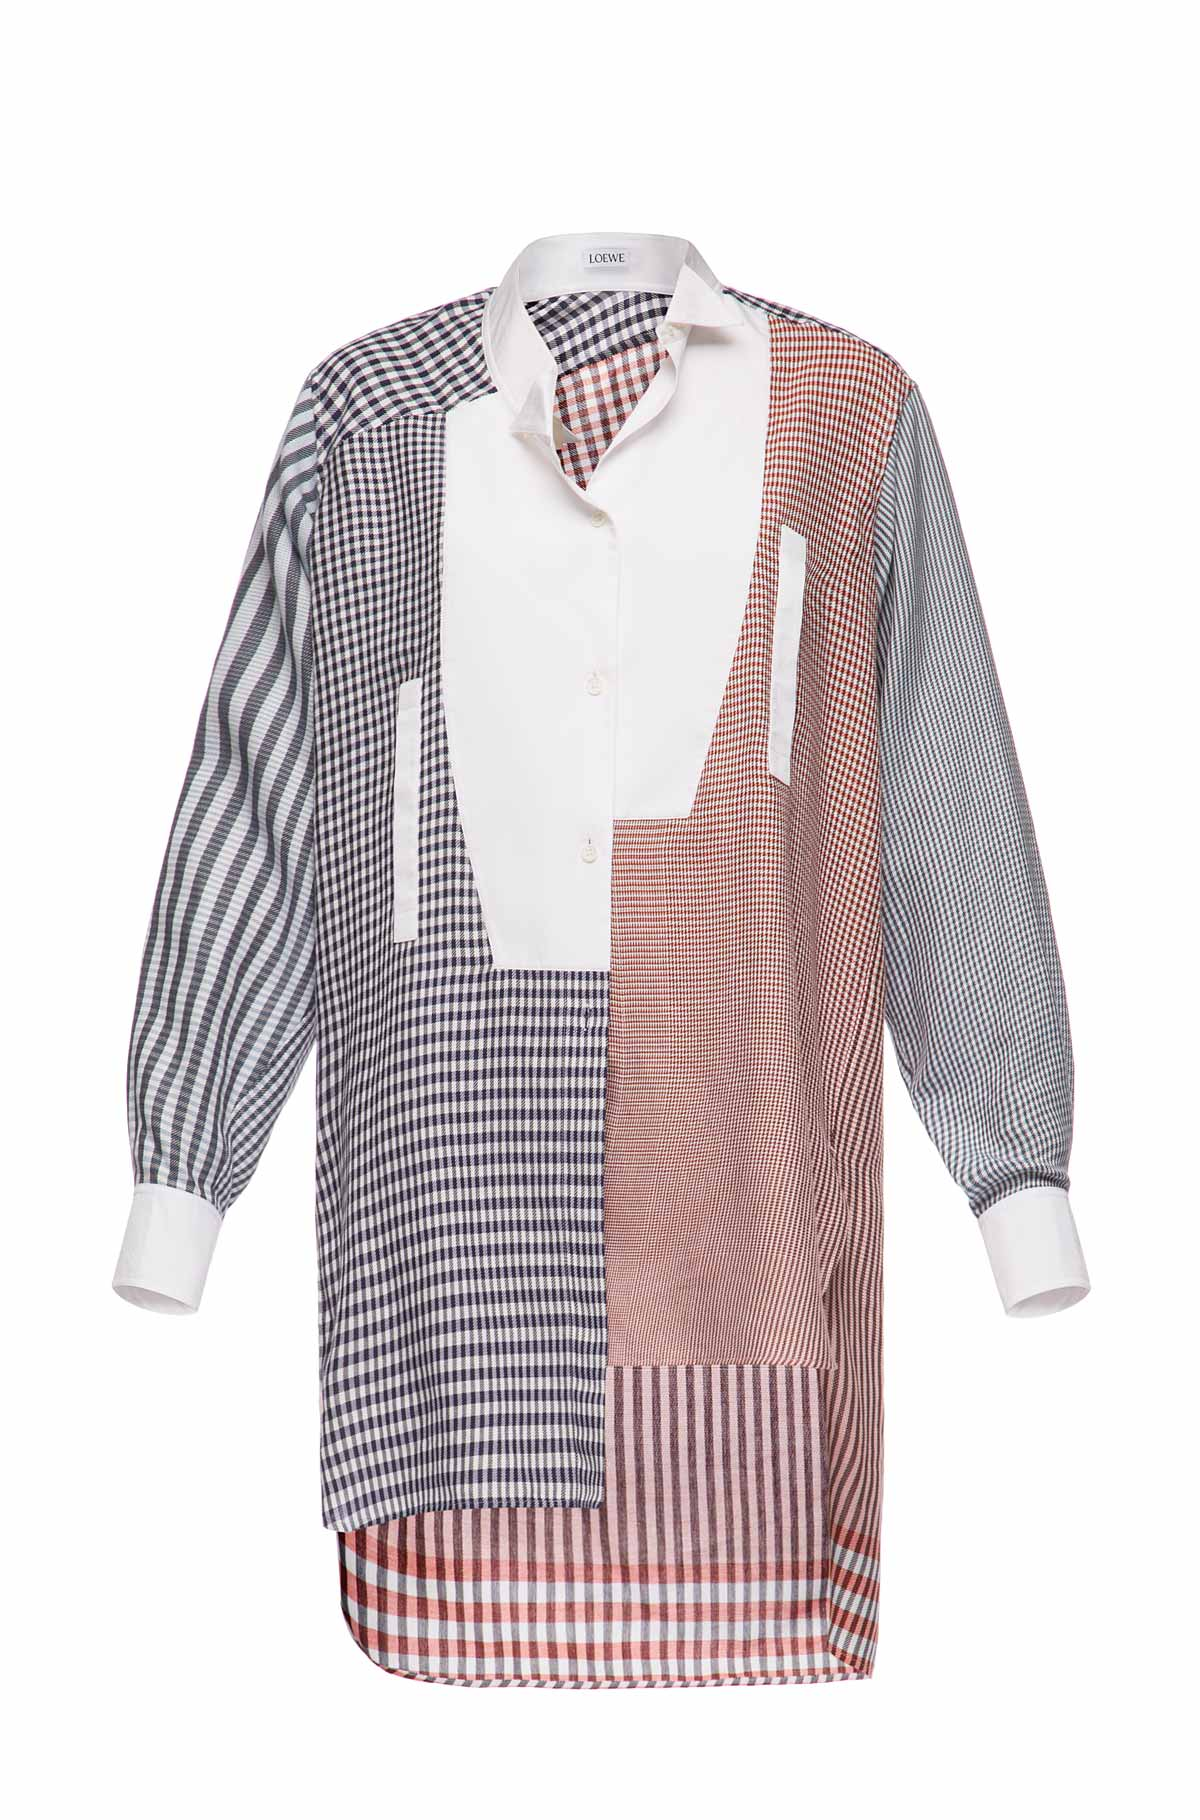 LOEWE Asymmetric Shirt Gingham Multicolor front